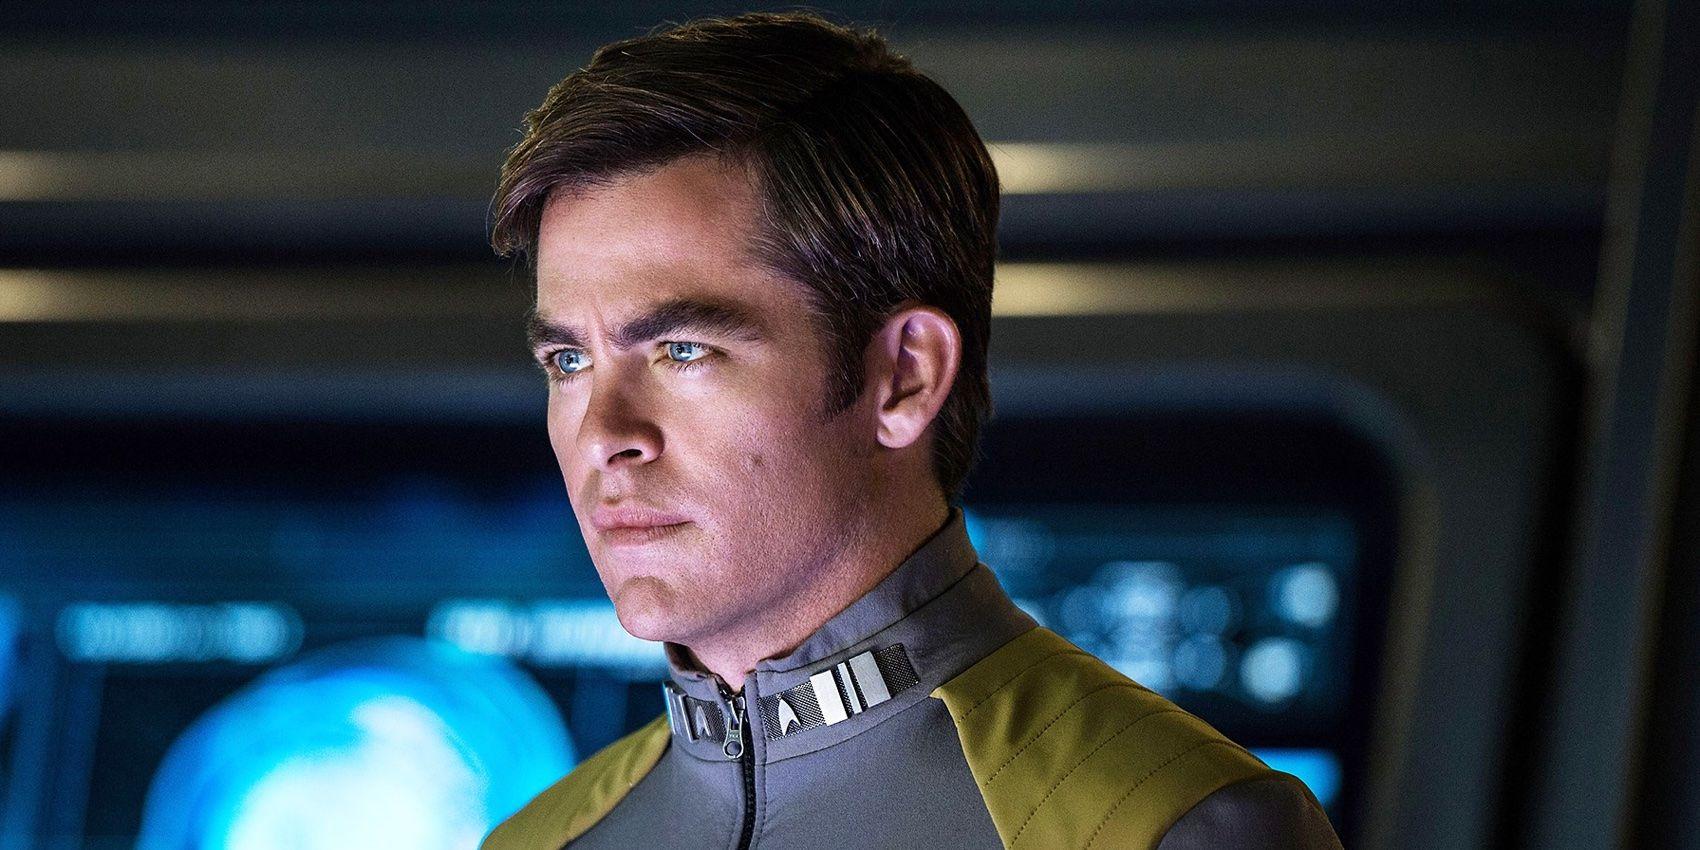 Star Trek 4 Sets Legion Creator Noah Hawley as Writer & Director